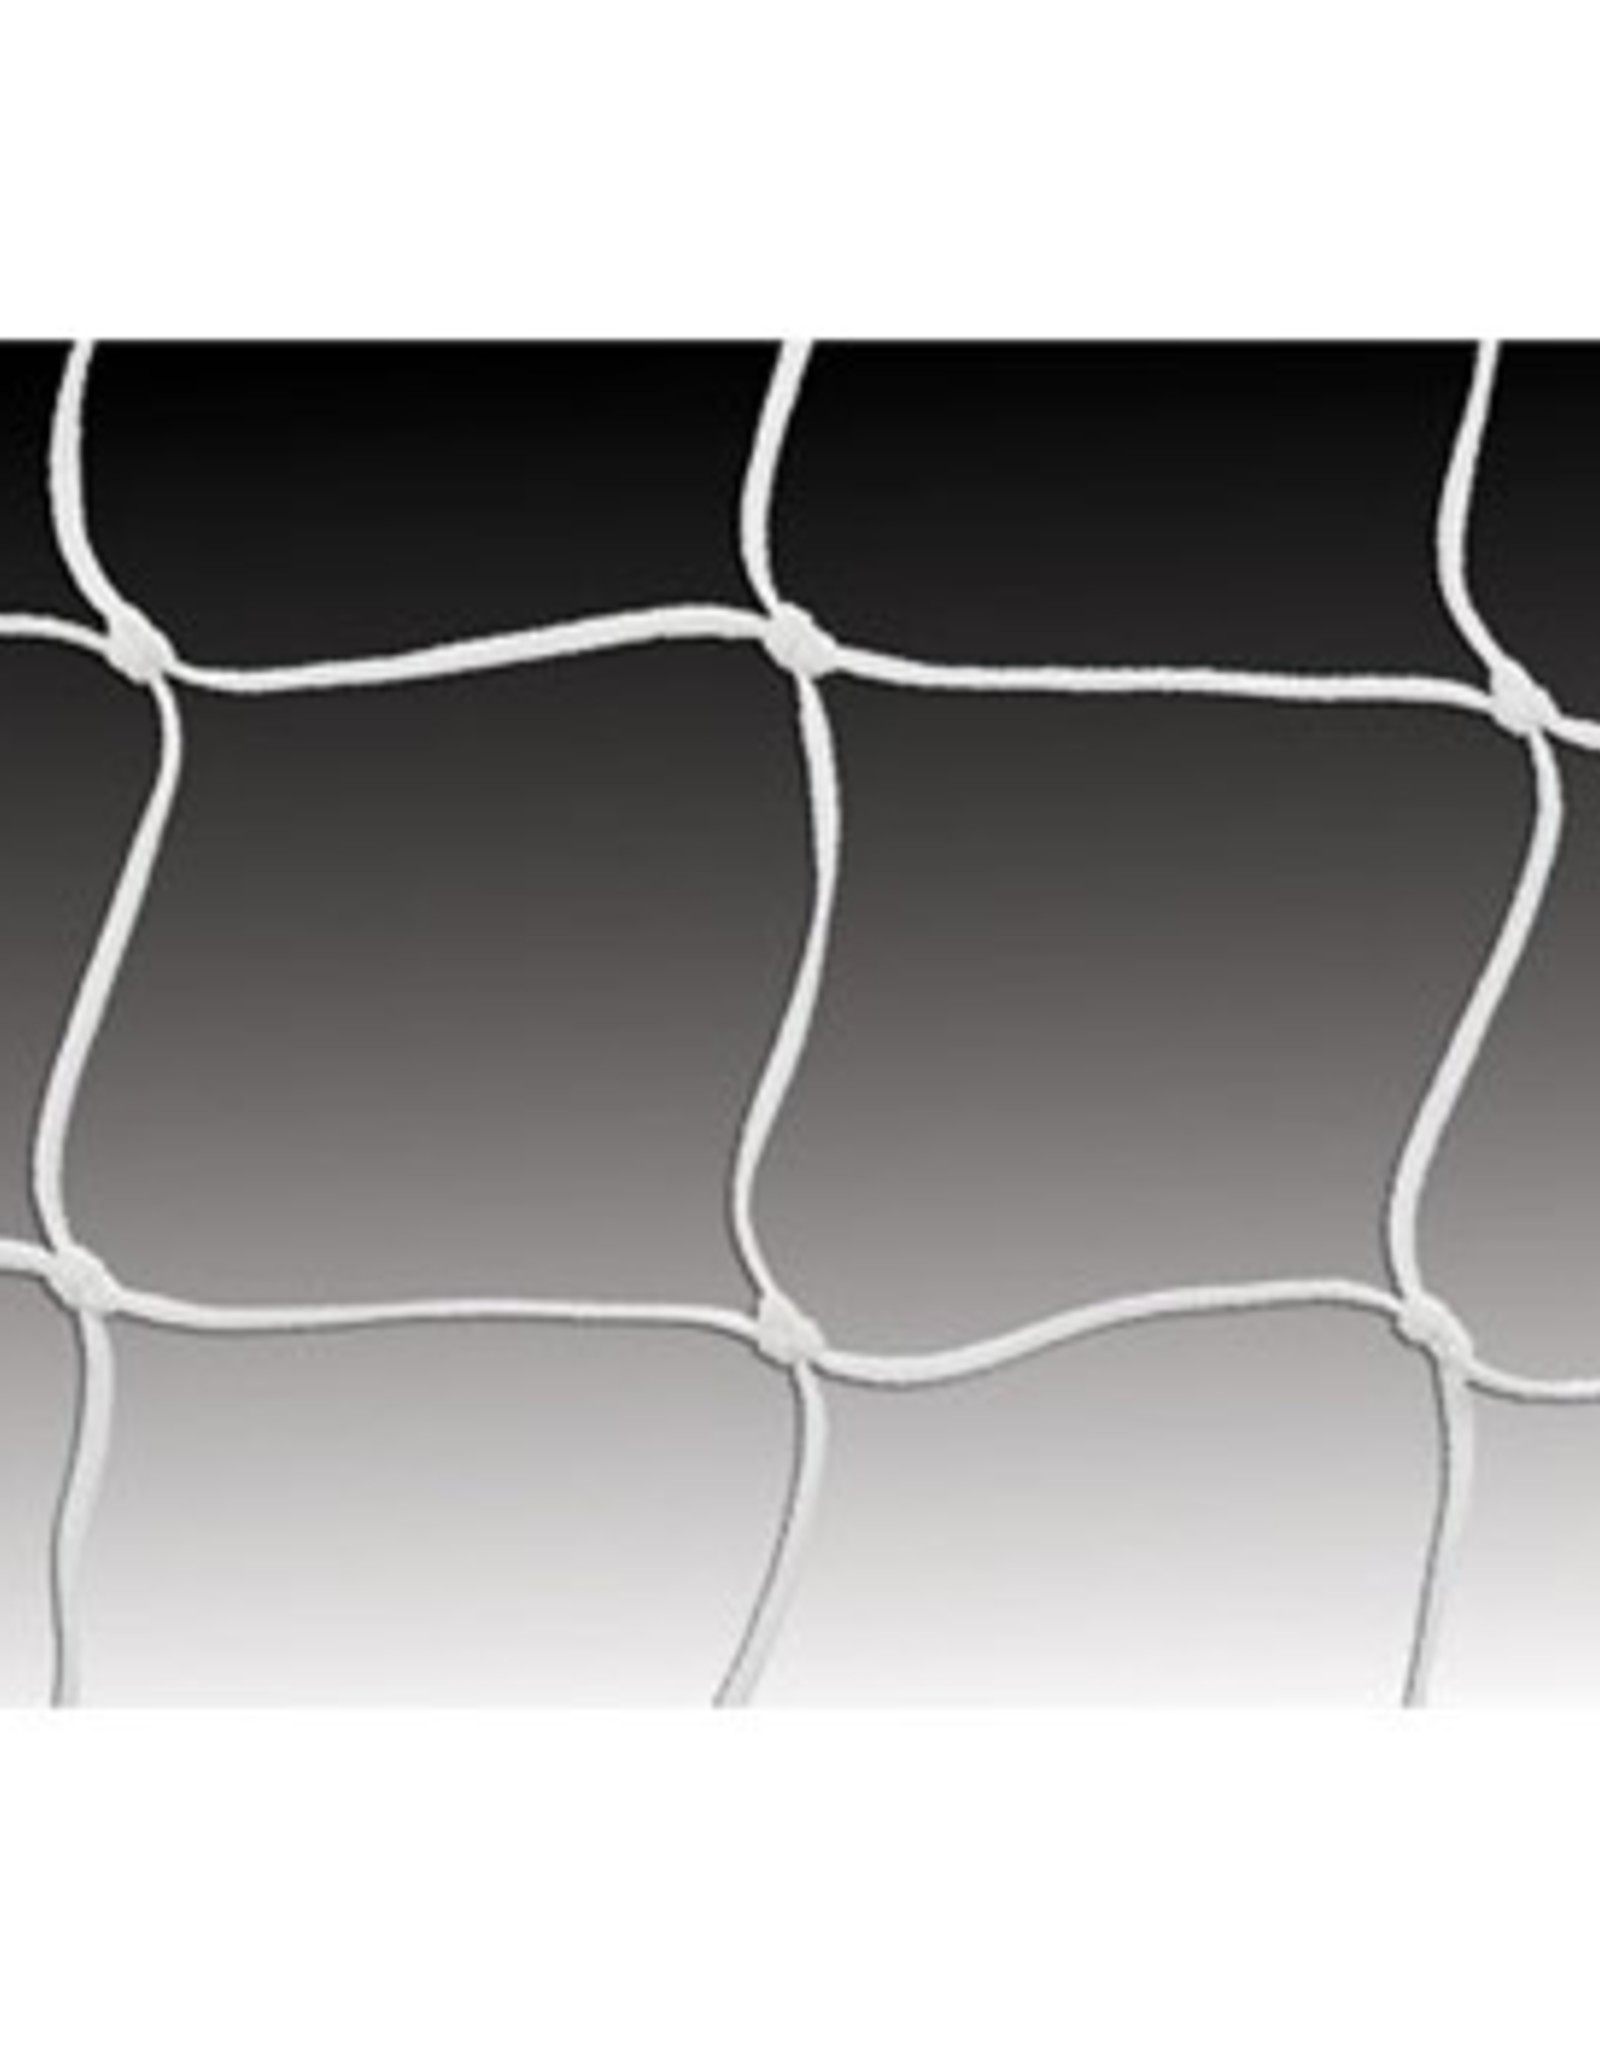 Kwik Goal Kwik Goal 8'H x 24'W x 4'D x 10'B Soccer Net